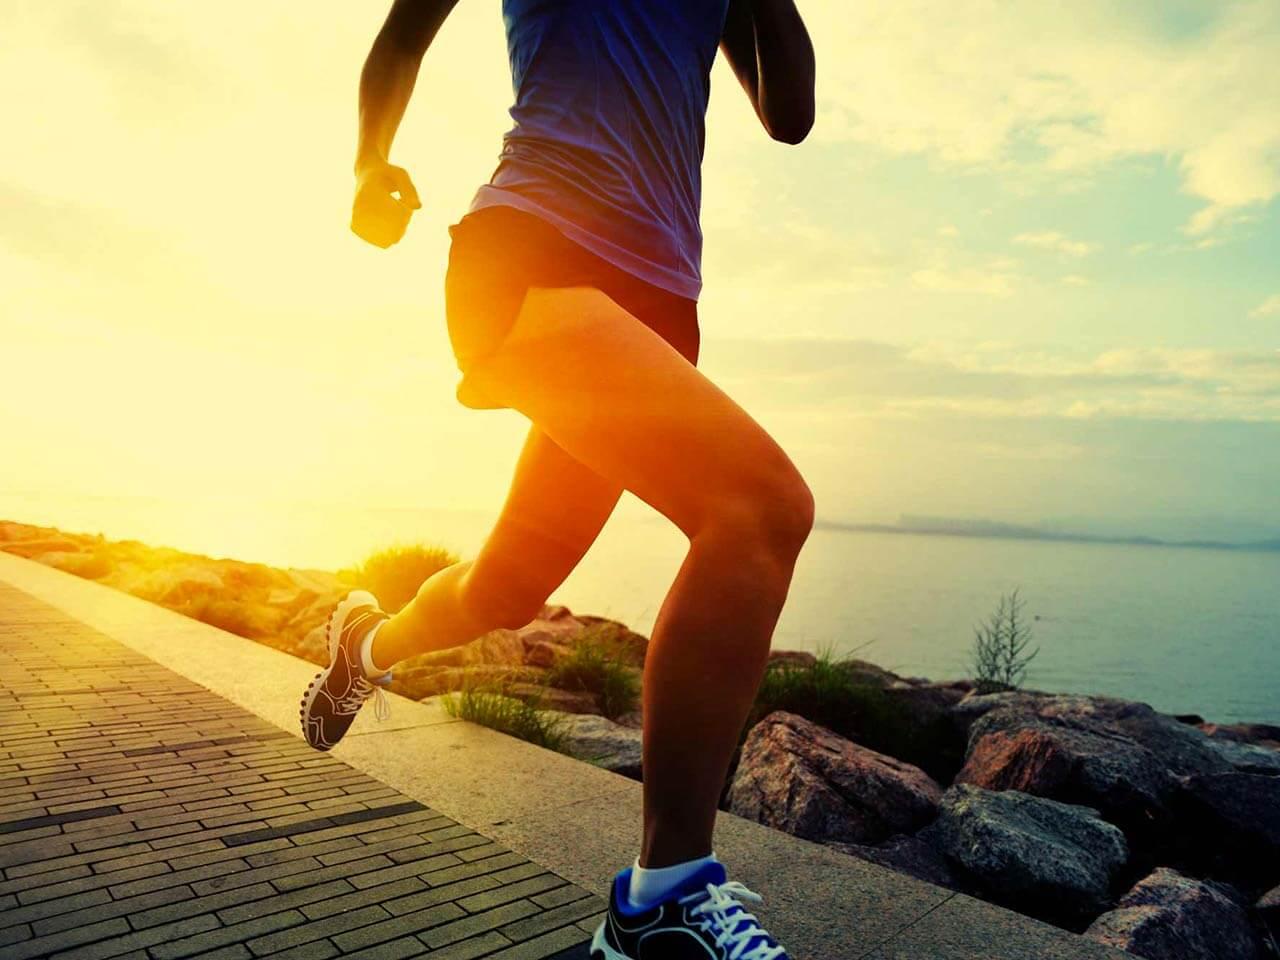 Person running along seaside